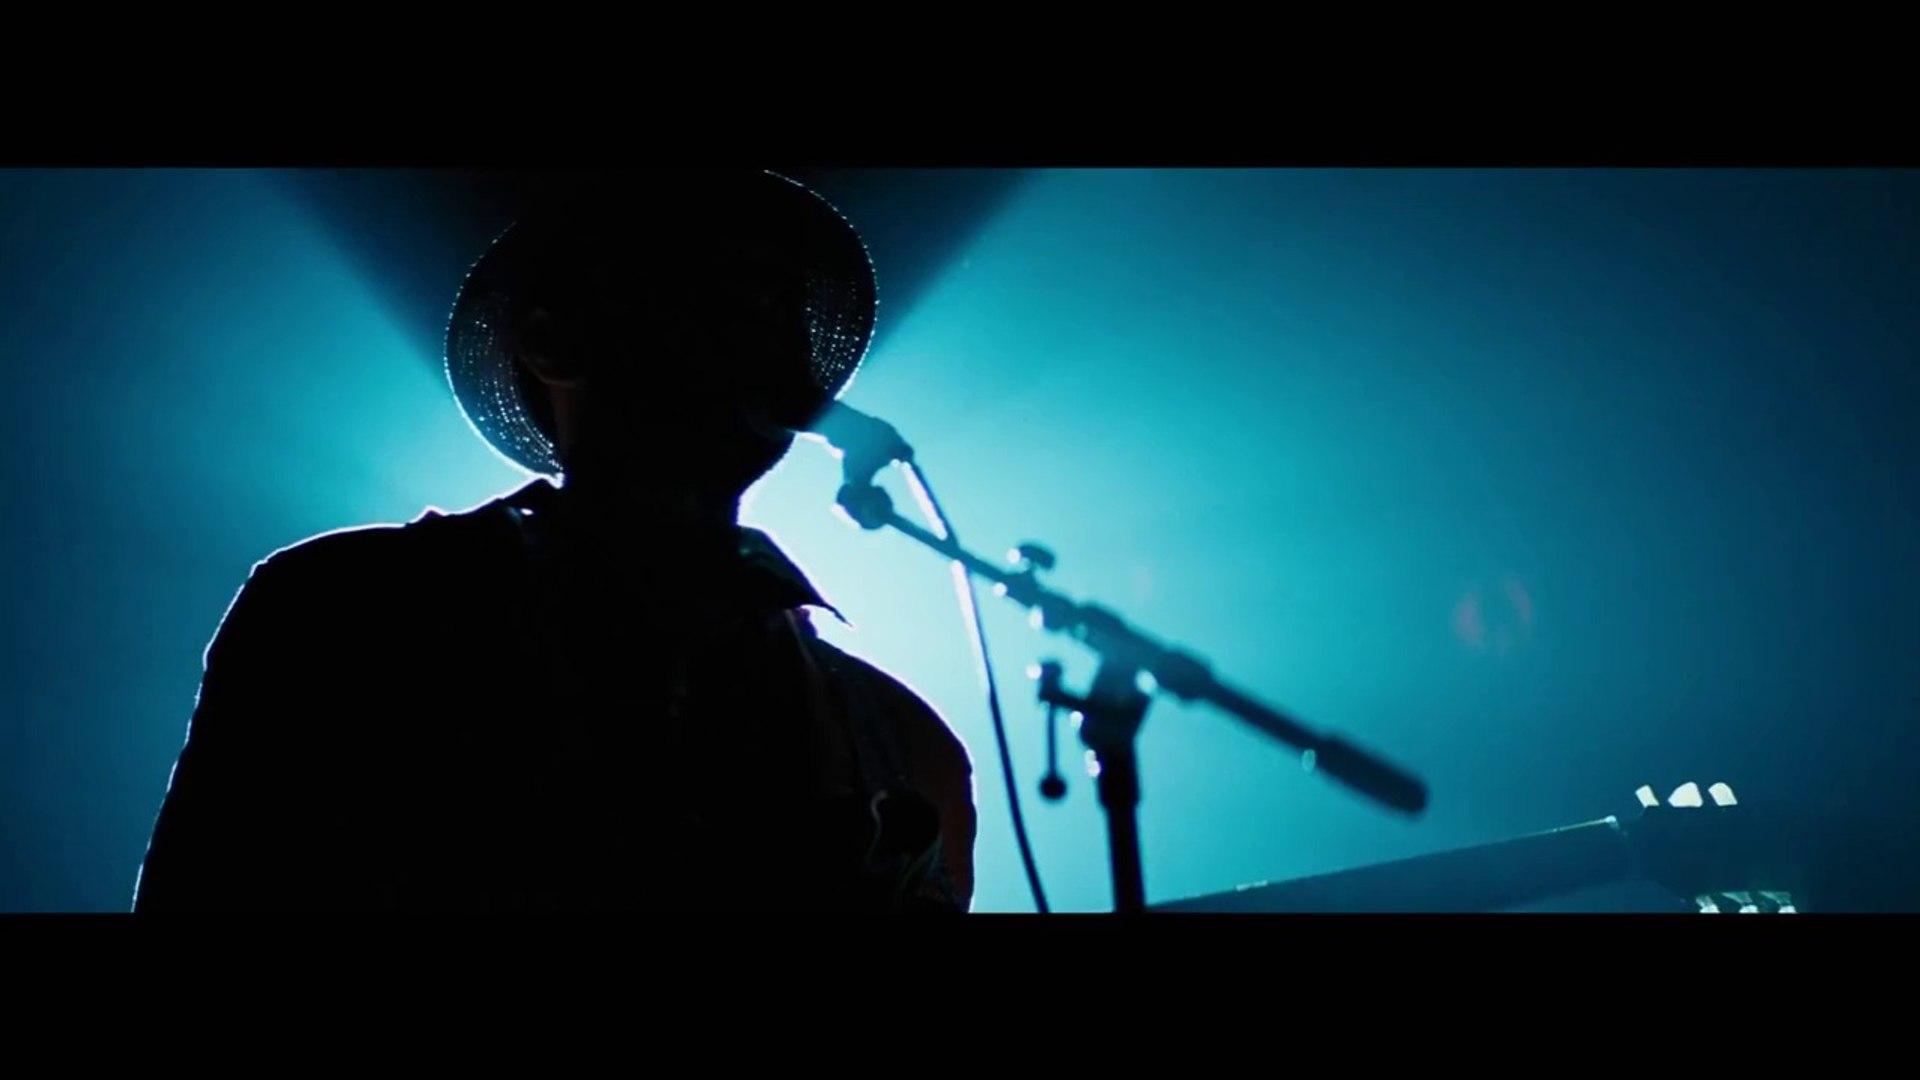 La La Land 'Start a Fire' Trailer (2017) _ Movieclips Trailers-iJi3zULqdPo